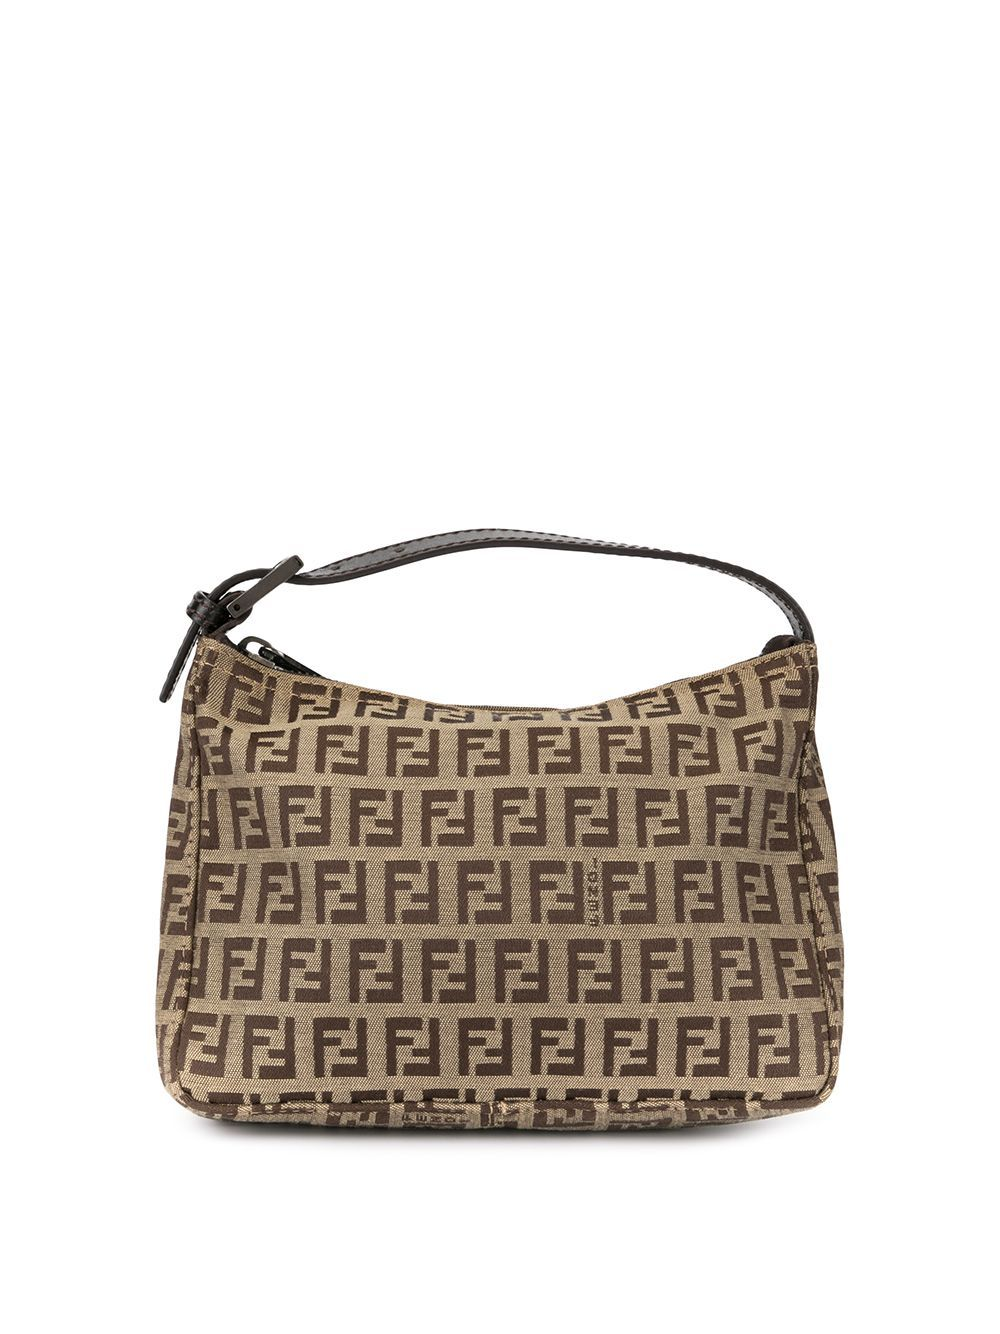 Fendi Pre Owned Zucca Pattern Handbag Farfetch Handbag Patterns Handbag Fendi